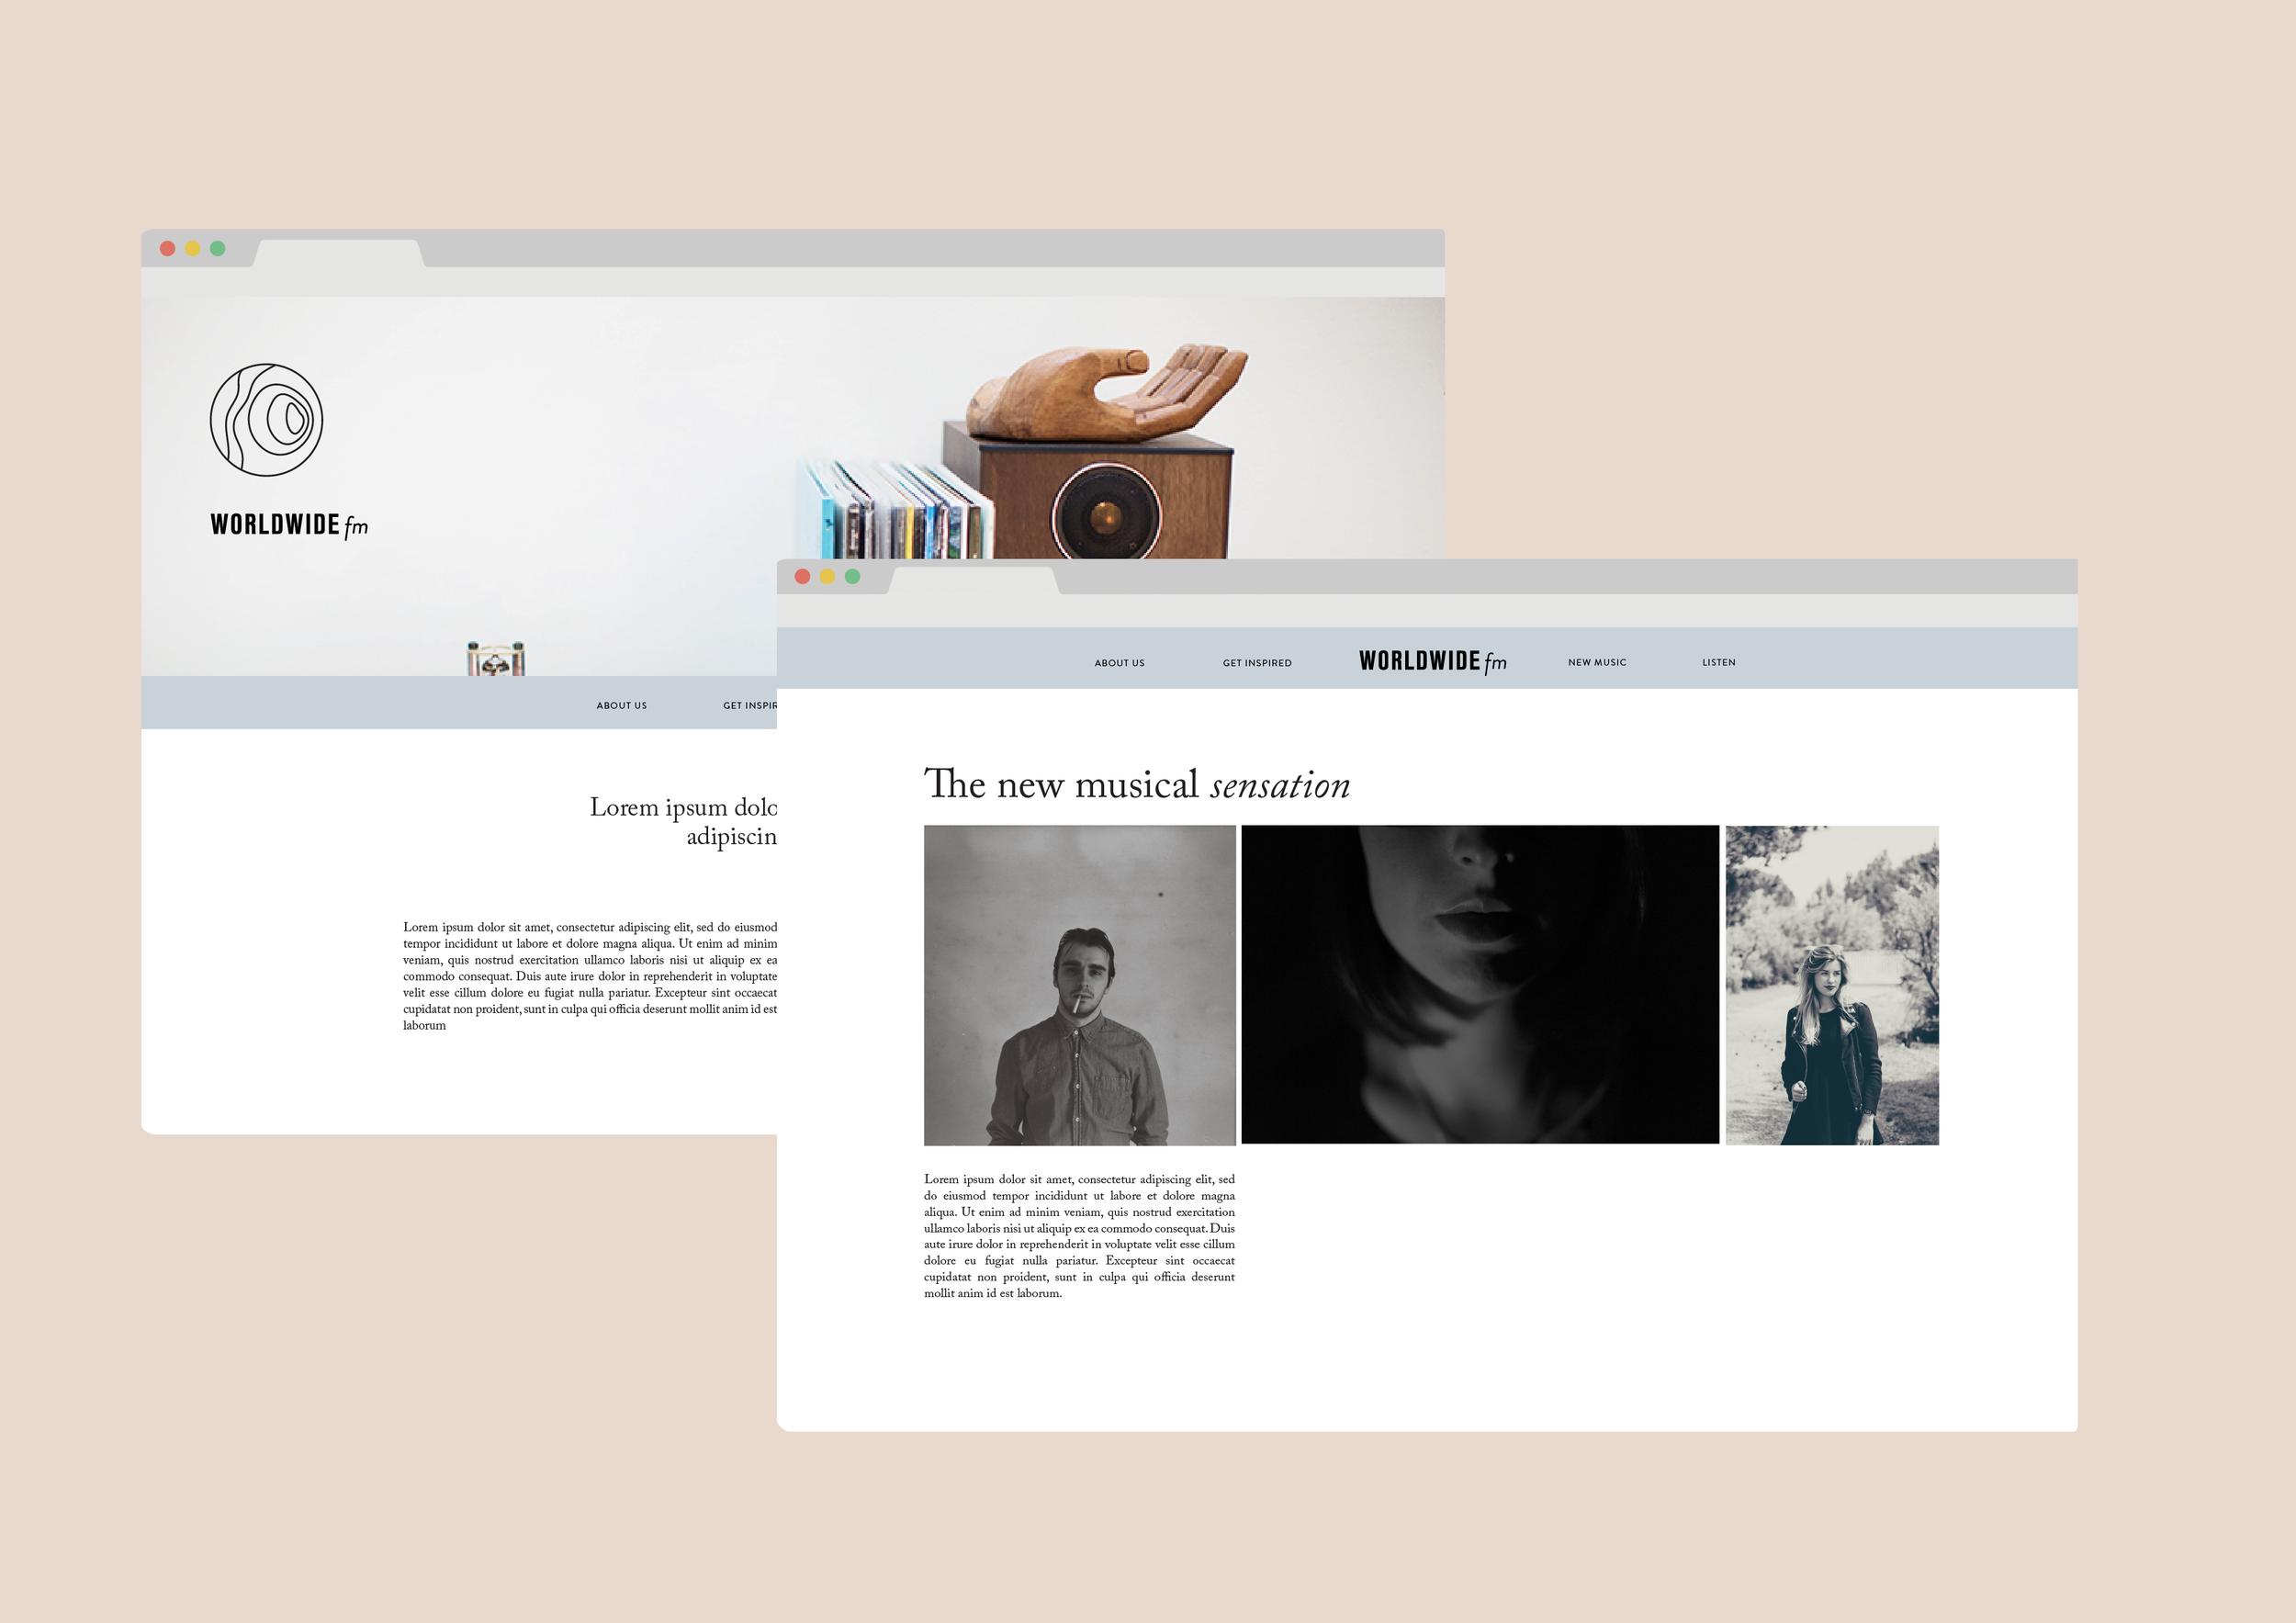 two-screens-website-broadcasting-worldwide